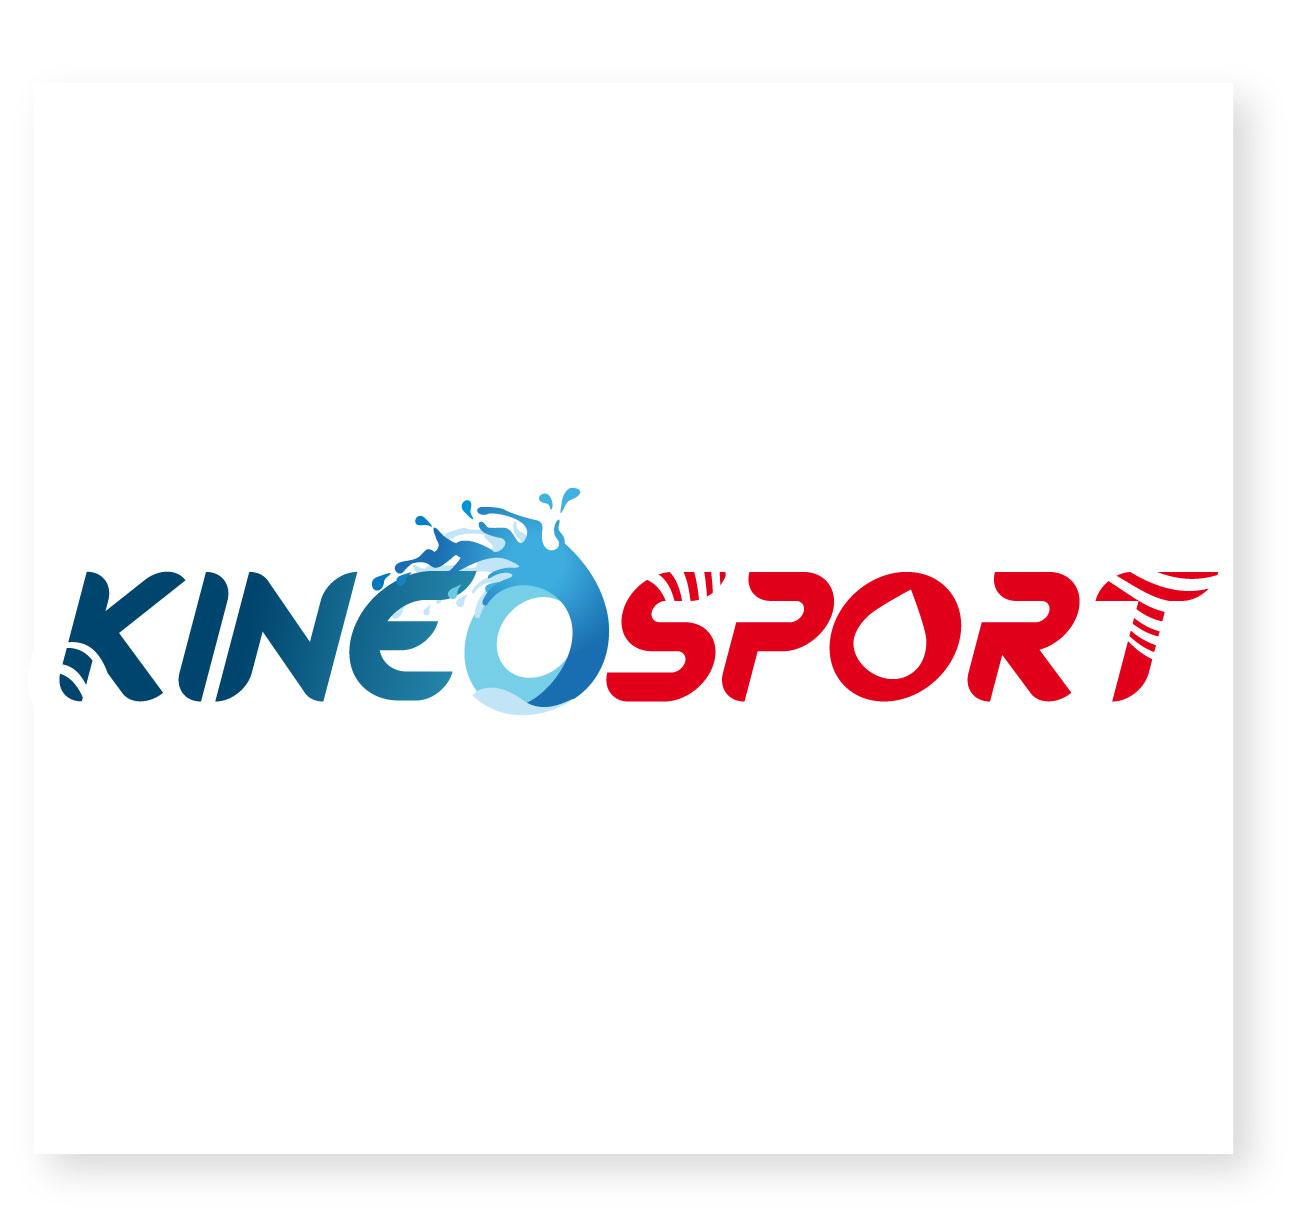 Logo Kineosport Saintes